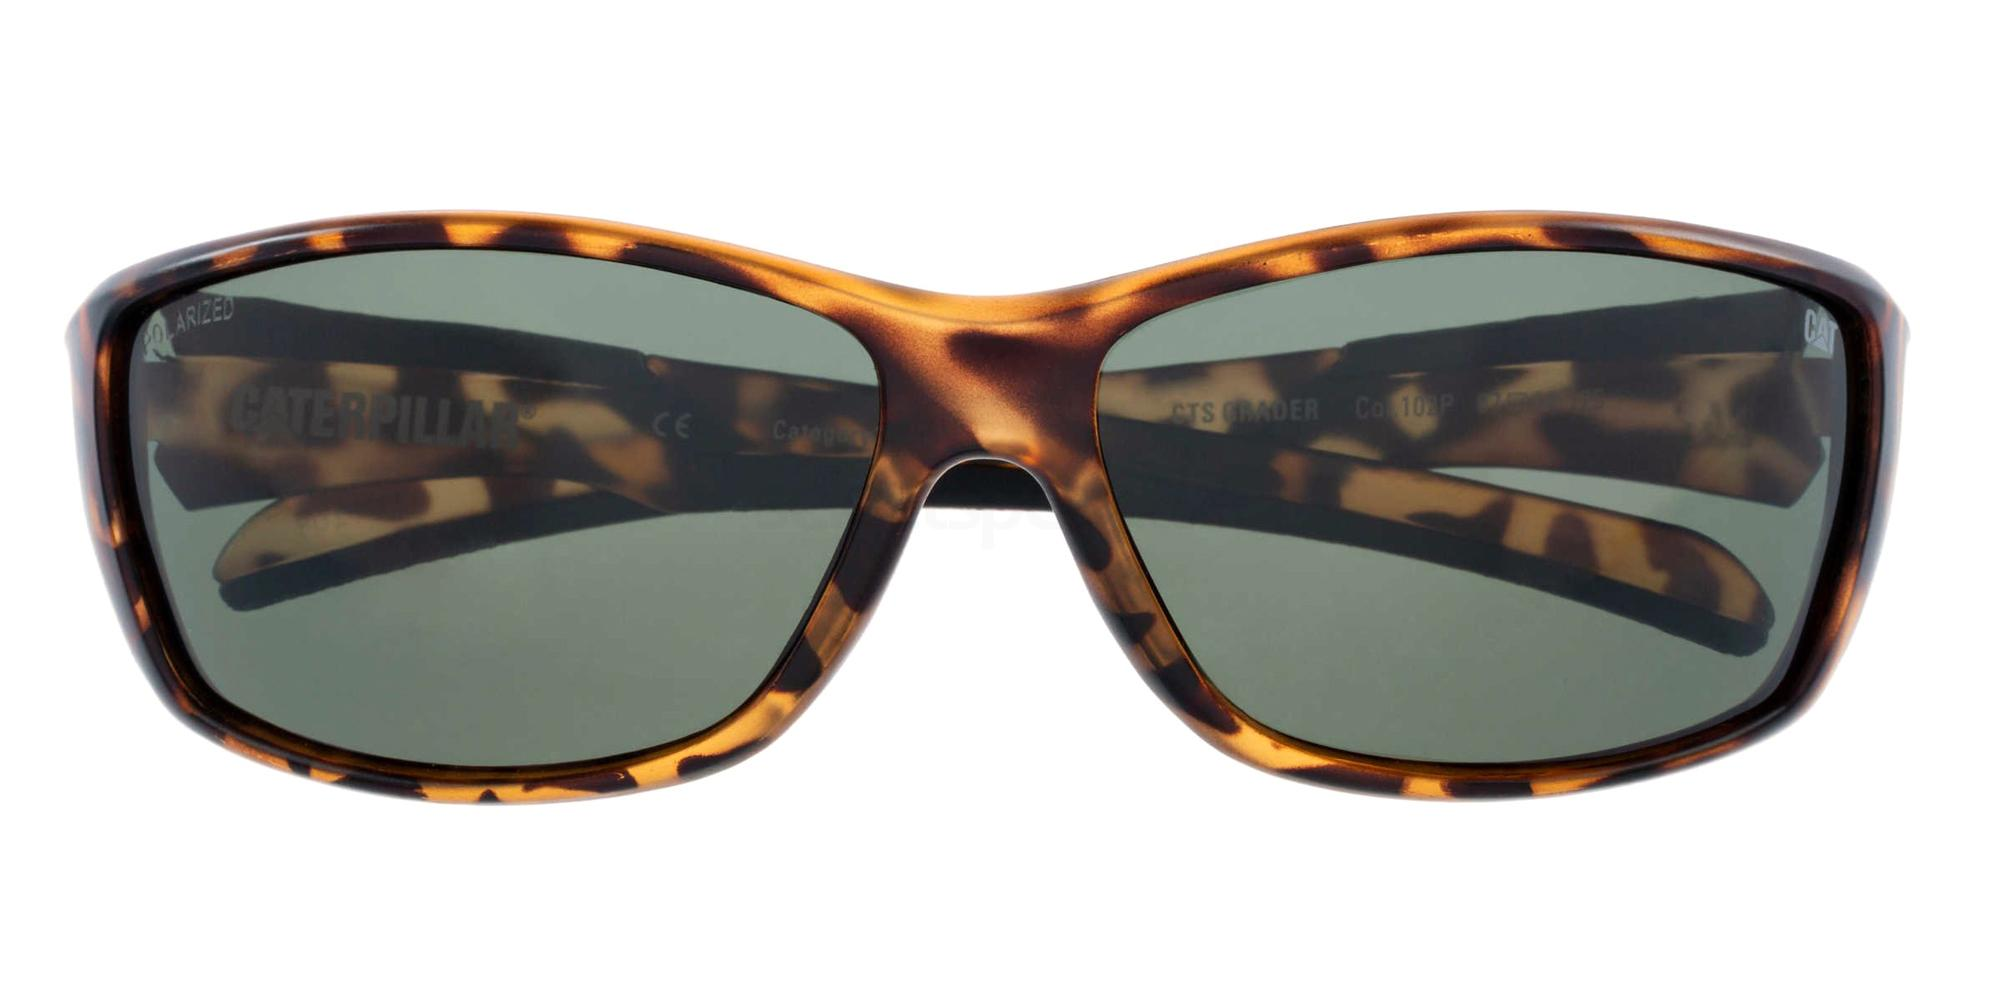 102P CTS-GRADER Sunglasses, CAT